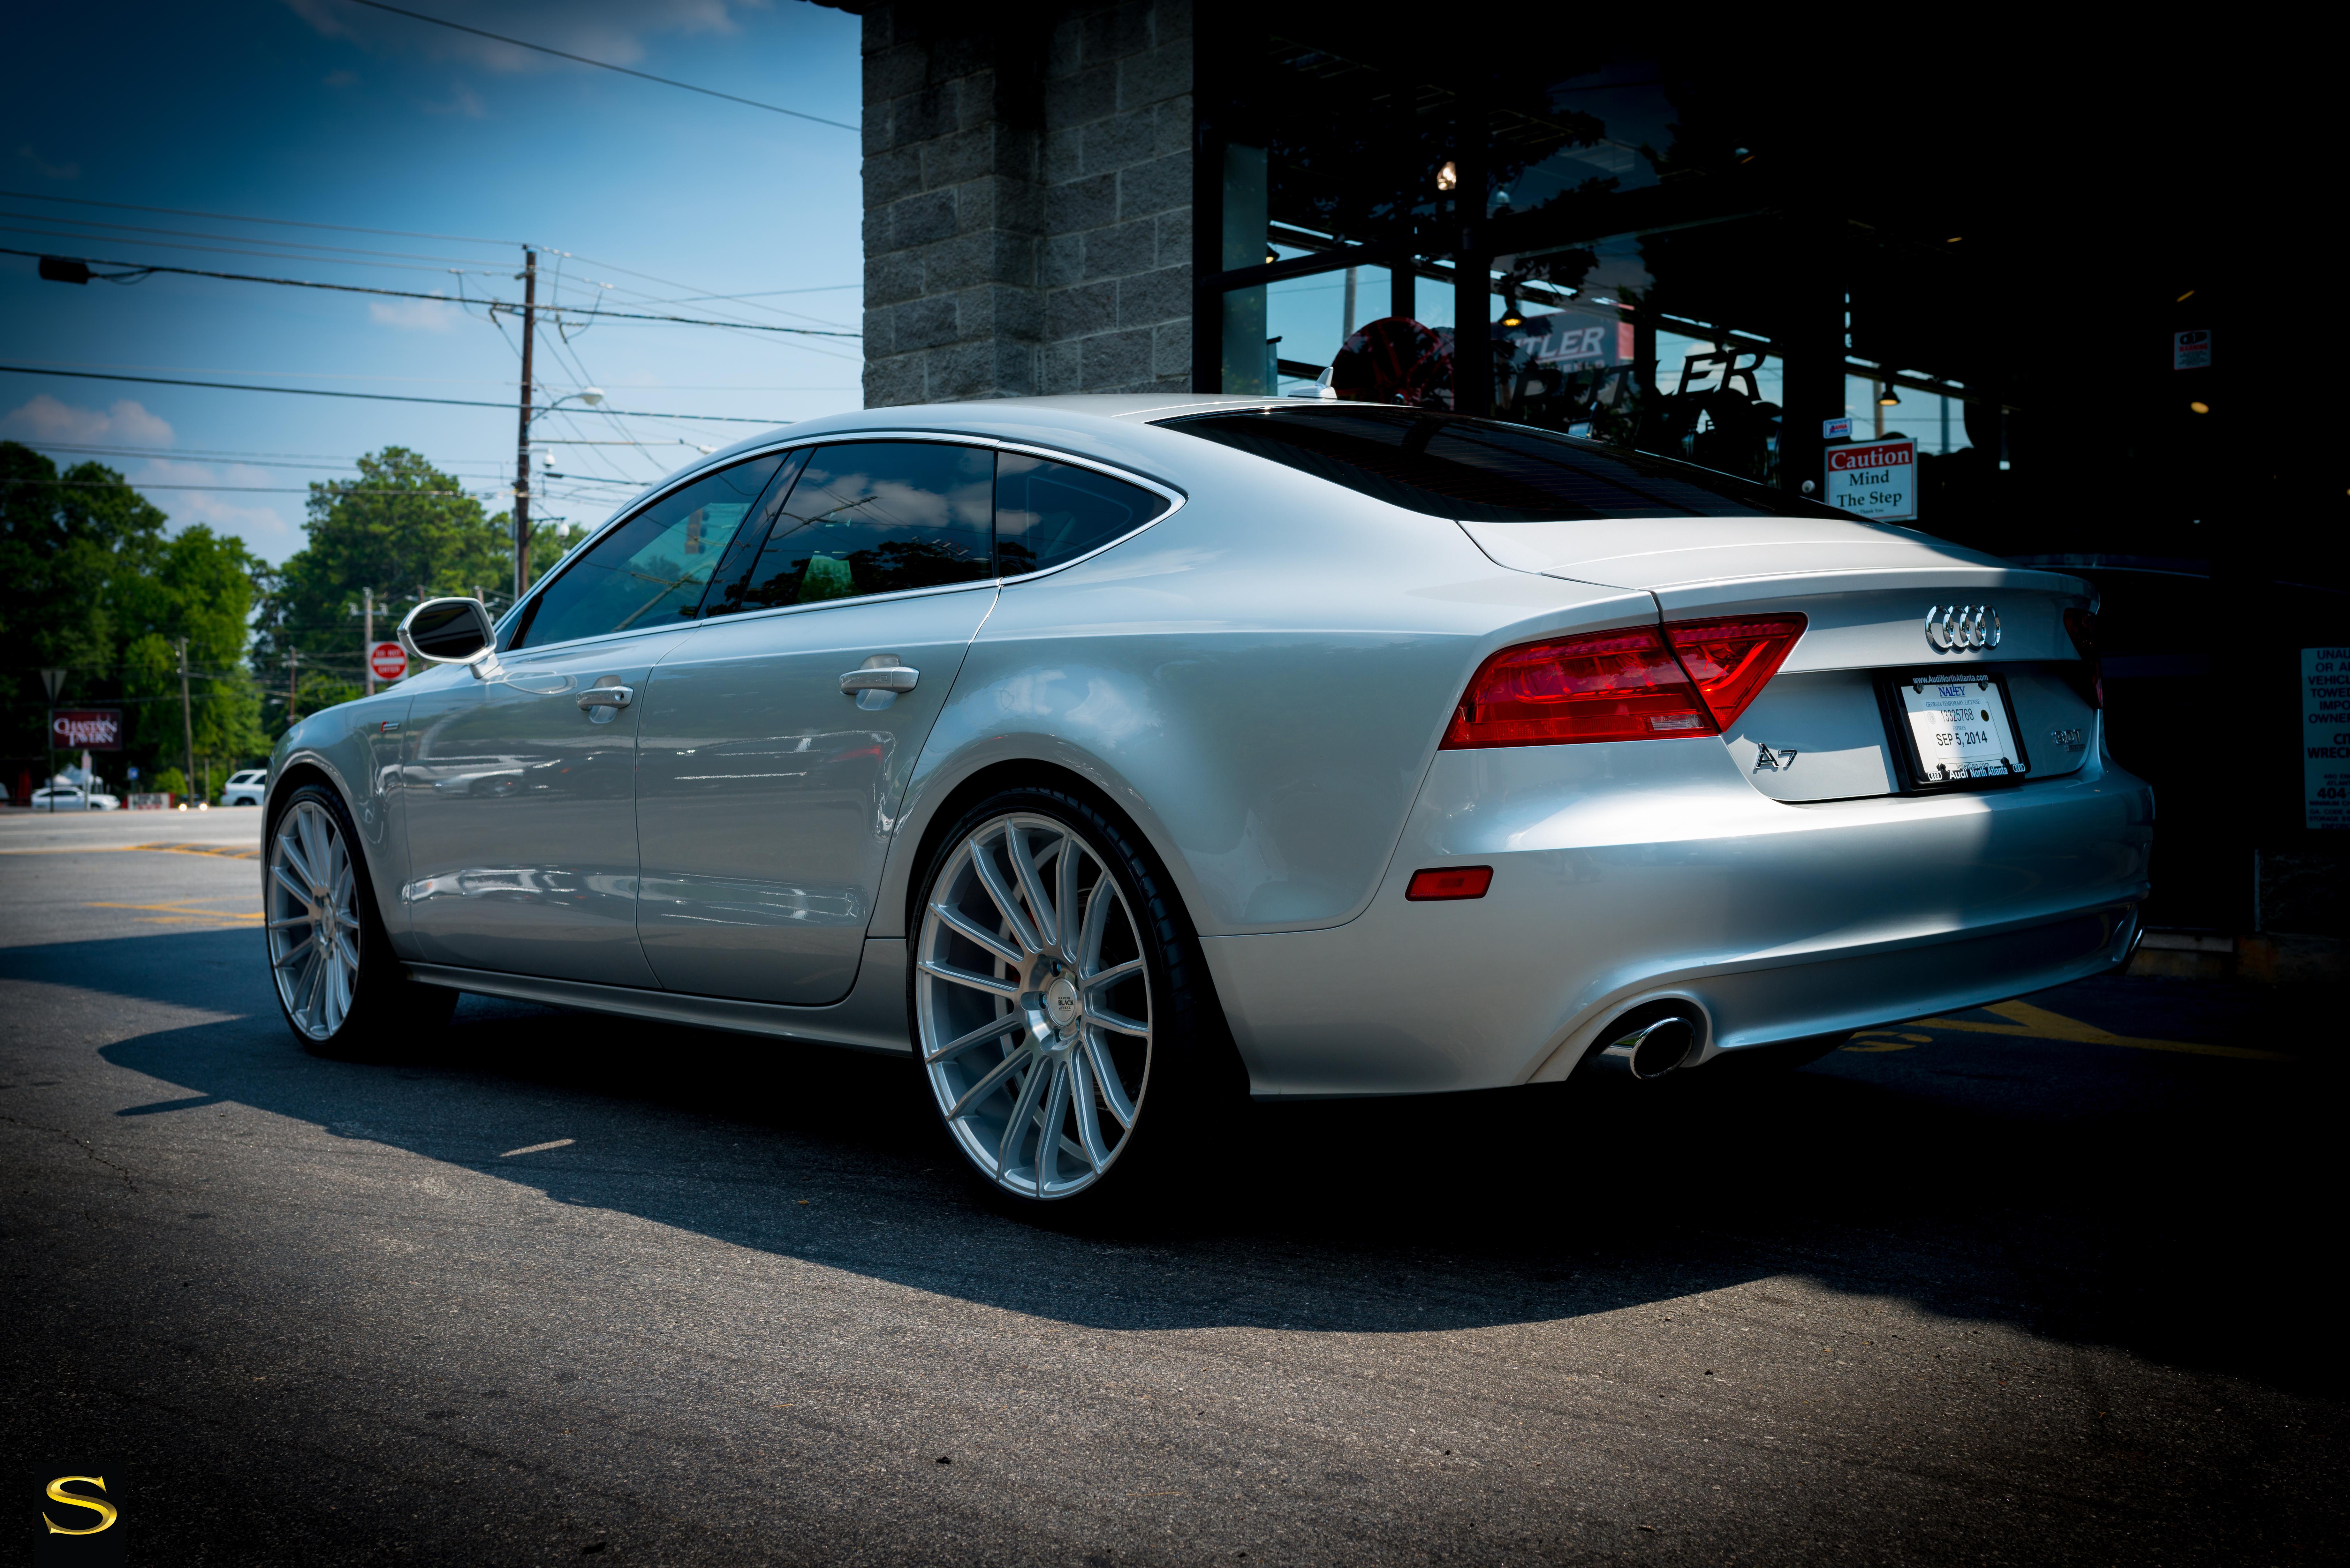 Audi A7 White With Black Rims